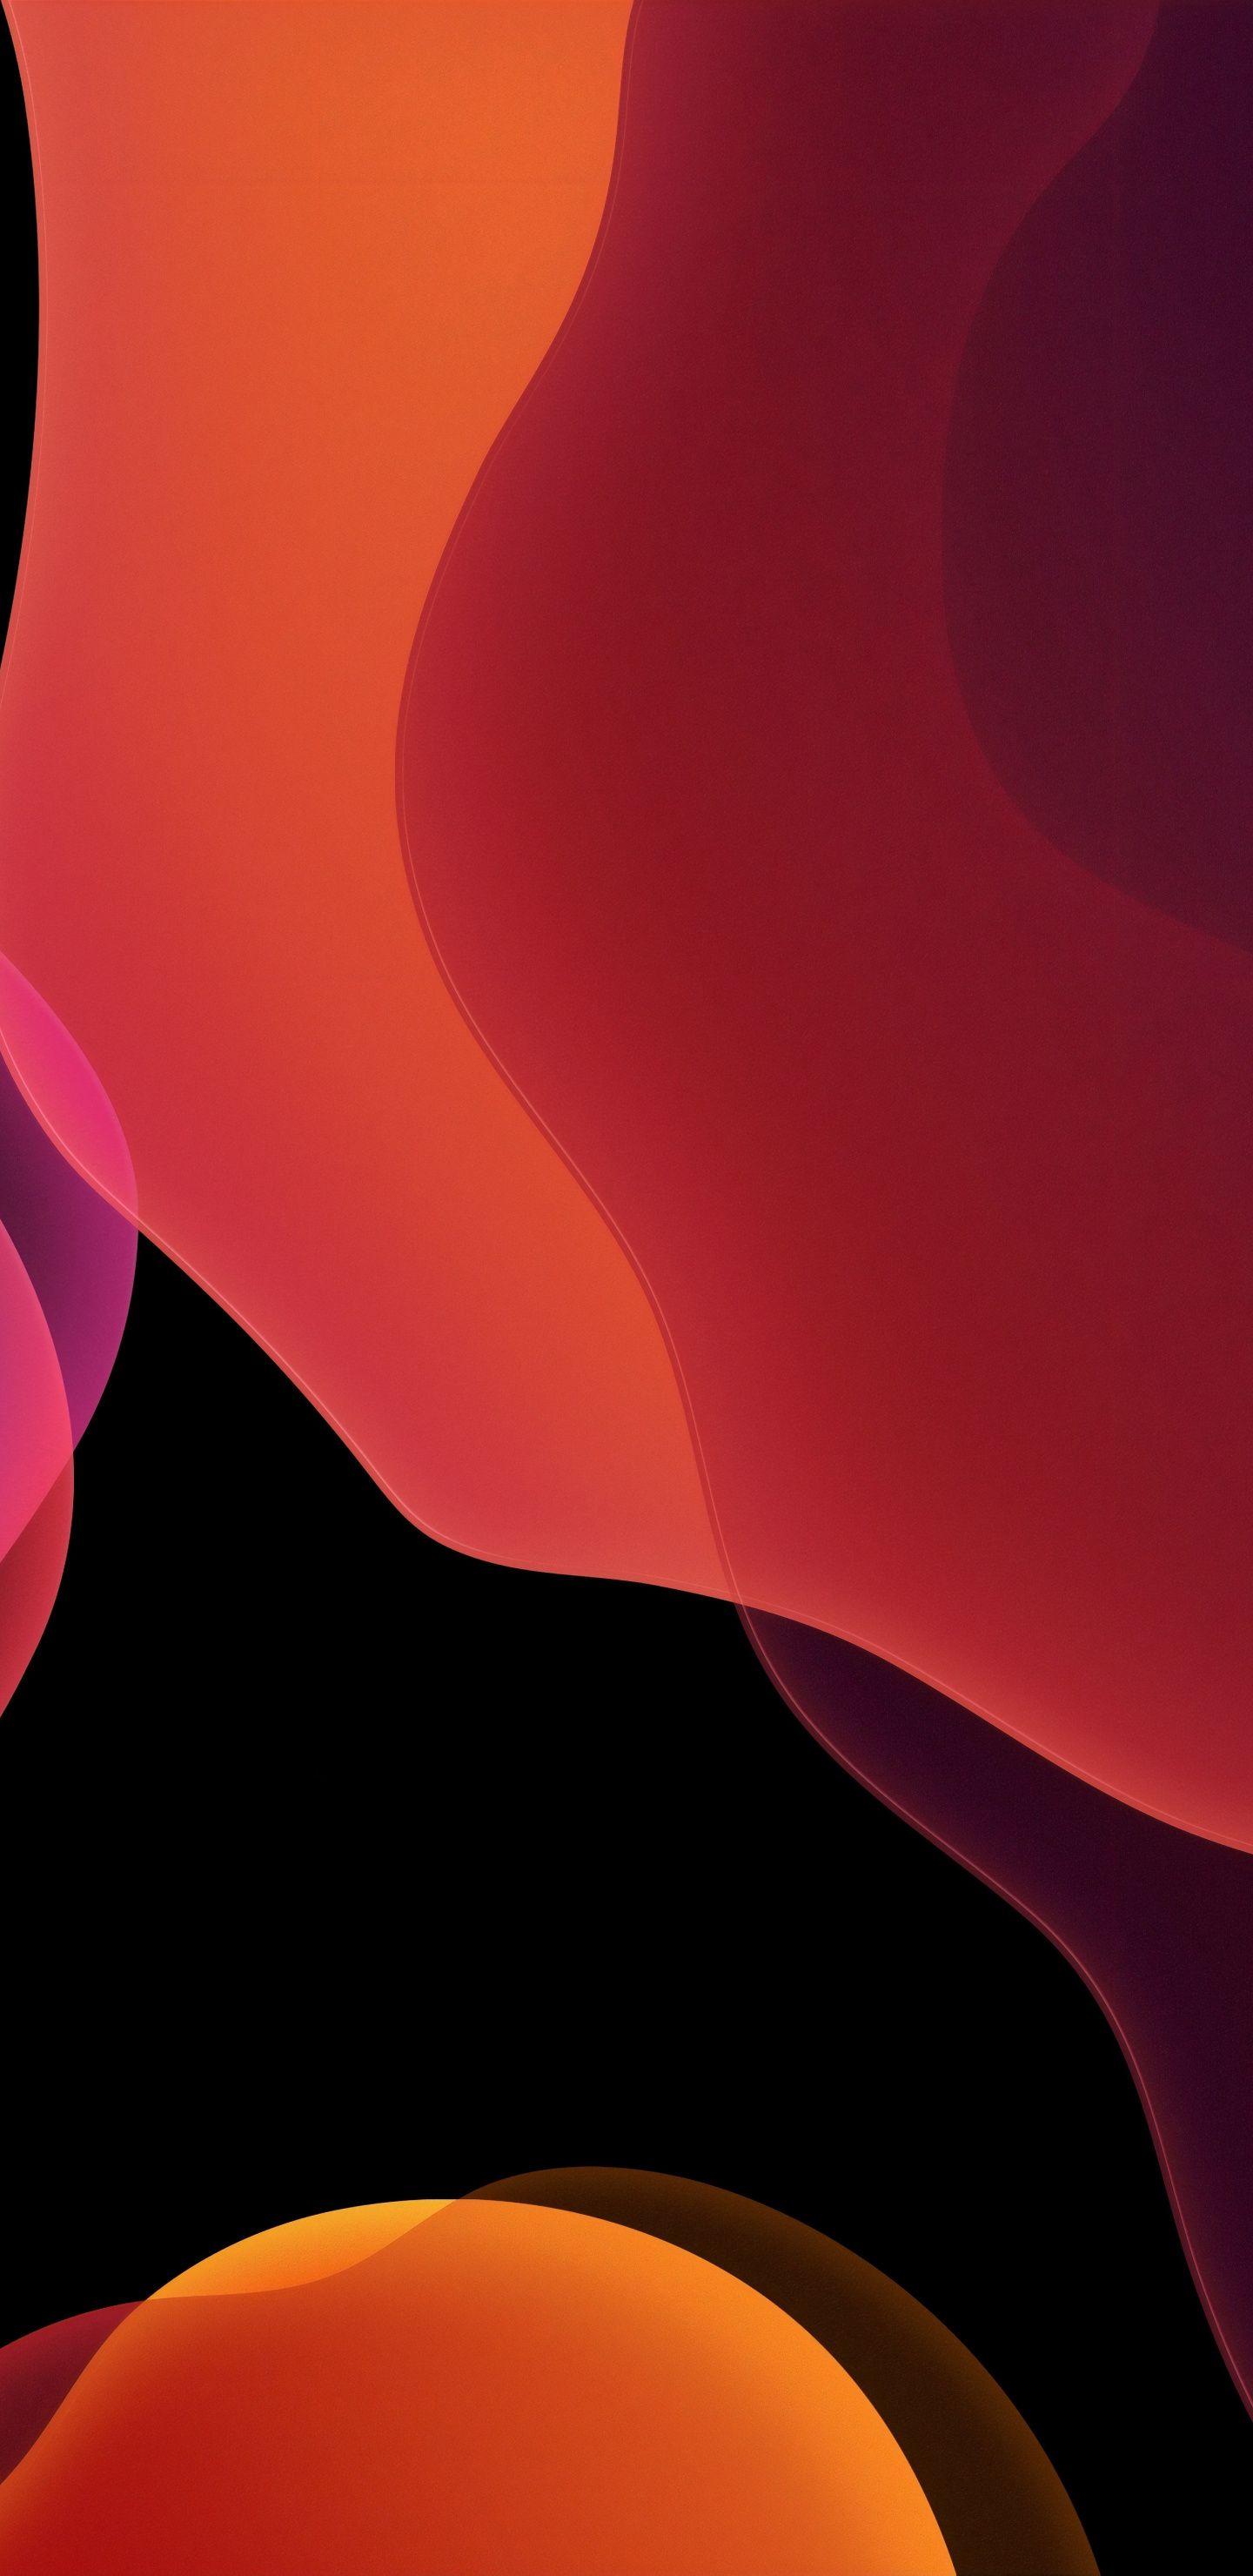 1440x2960 Stock iOS 13 dark orange abstract wallpaper Iphone 1440x2960